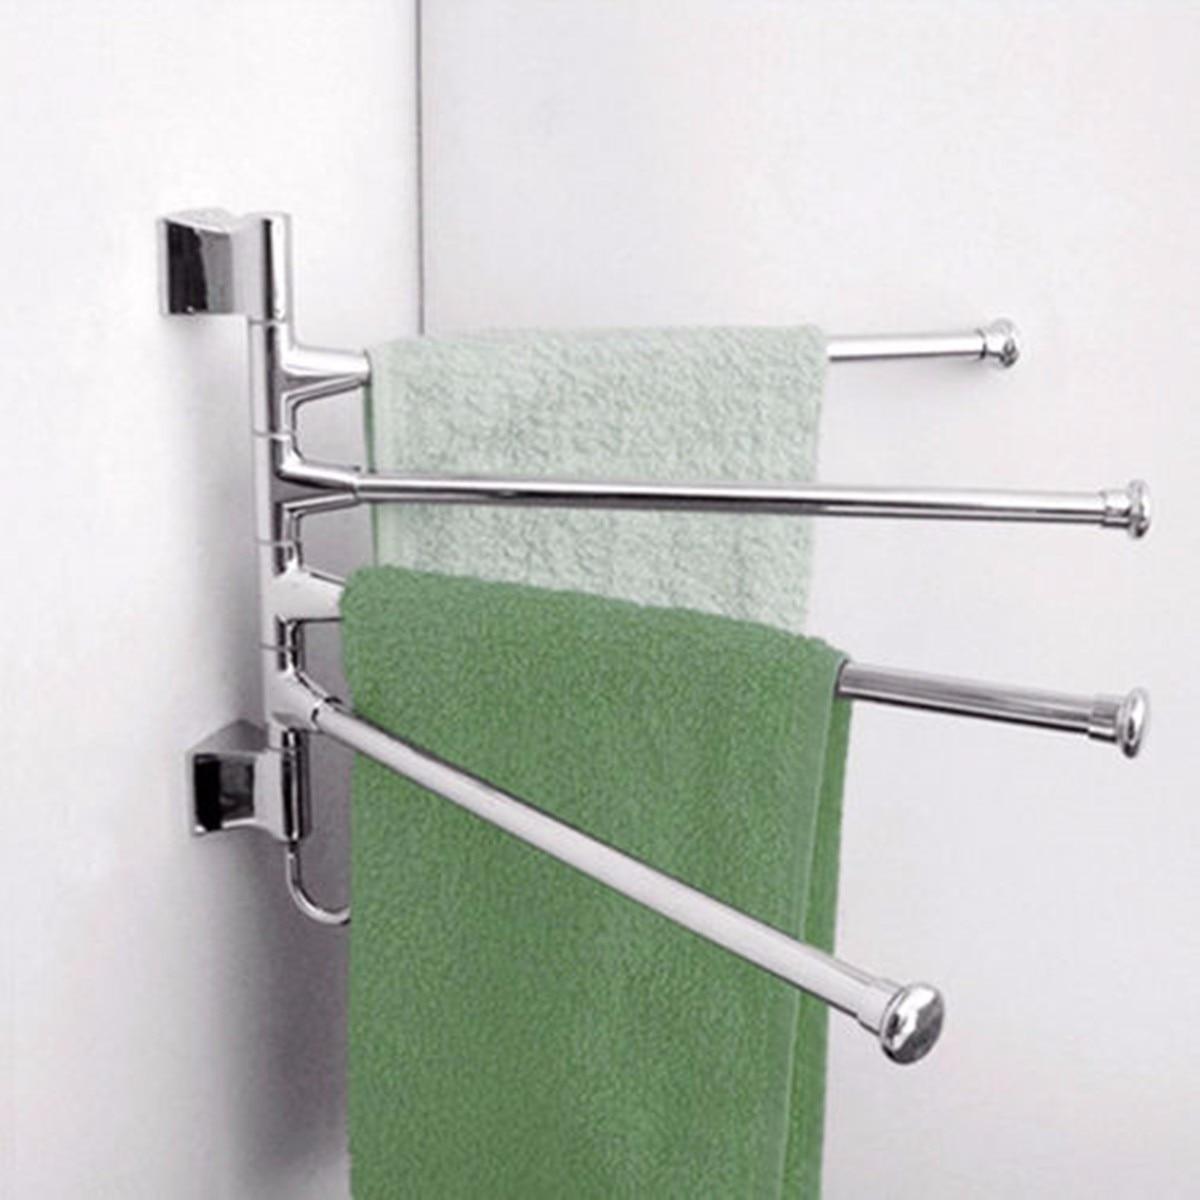 Bathroom Towel Popular Swivel Towel Rack Buy Cheap Swivel Towel Rack Lots From